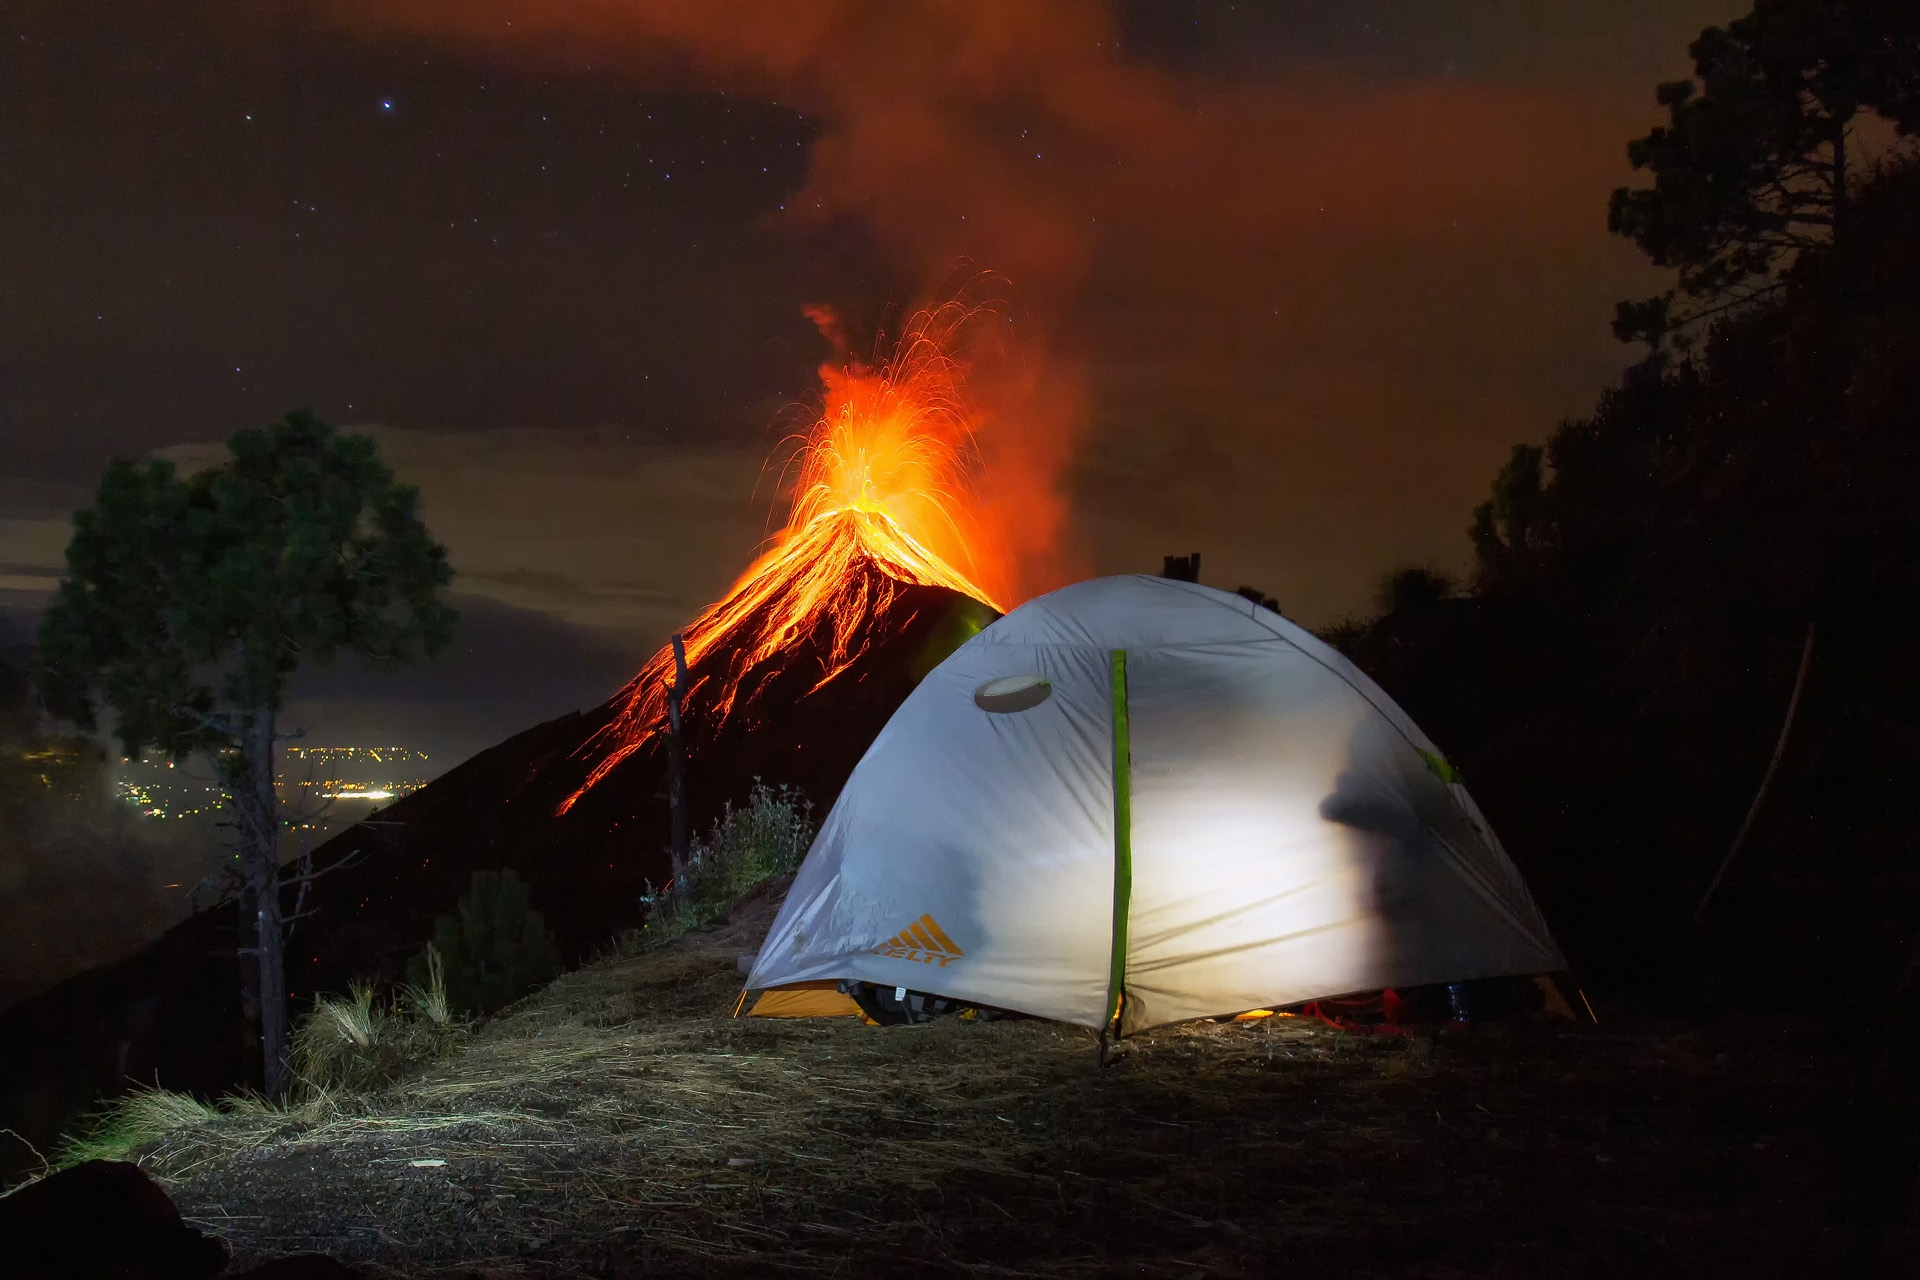 Acatenango Camping, Fuego, Vuklan, Fire, Feuer, Vulcano, South America, SA, Adventure, Antigua, Guatemala